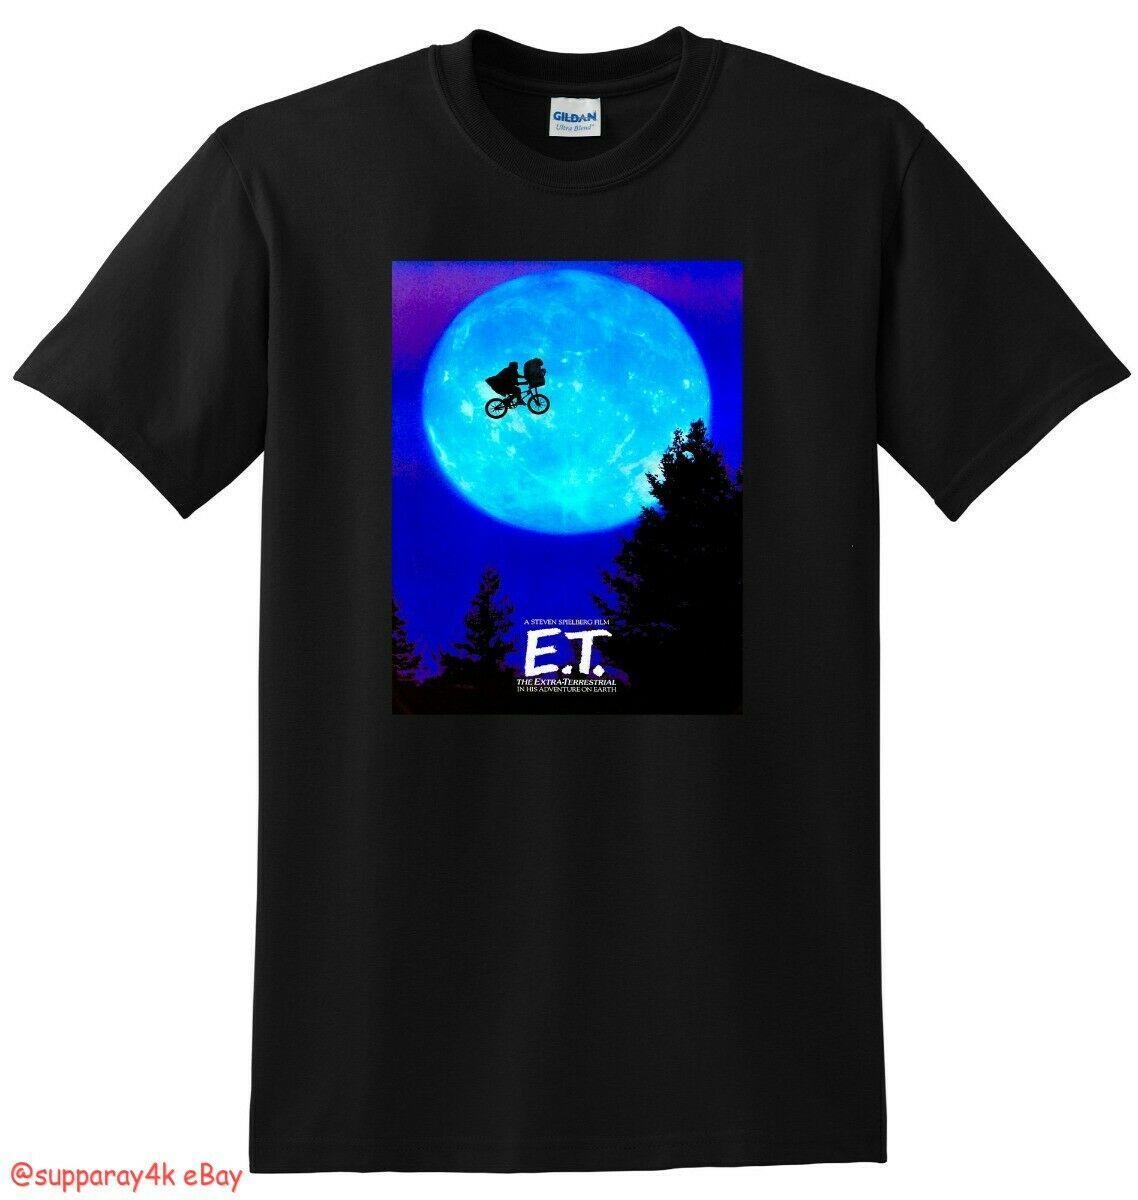 Novo et t camisa extra terrestre 4k bluray dvd capa pequeno médio grande xl